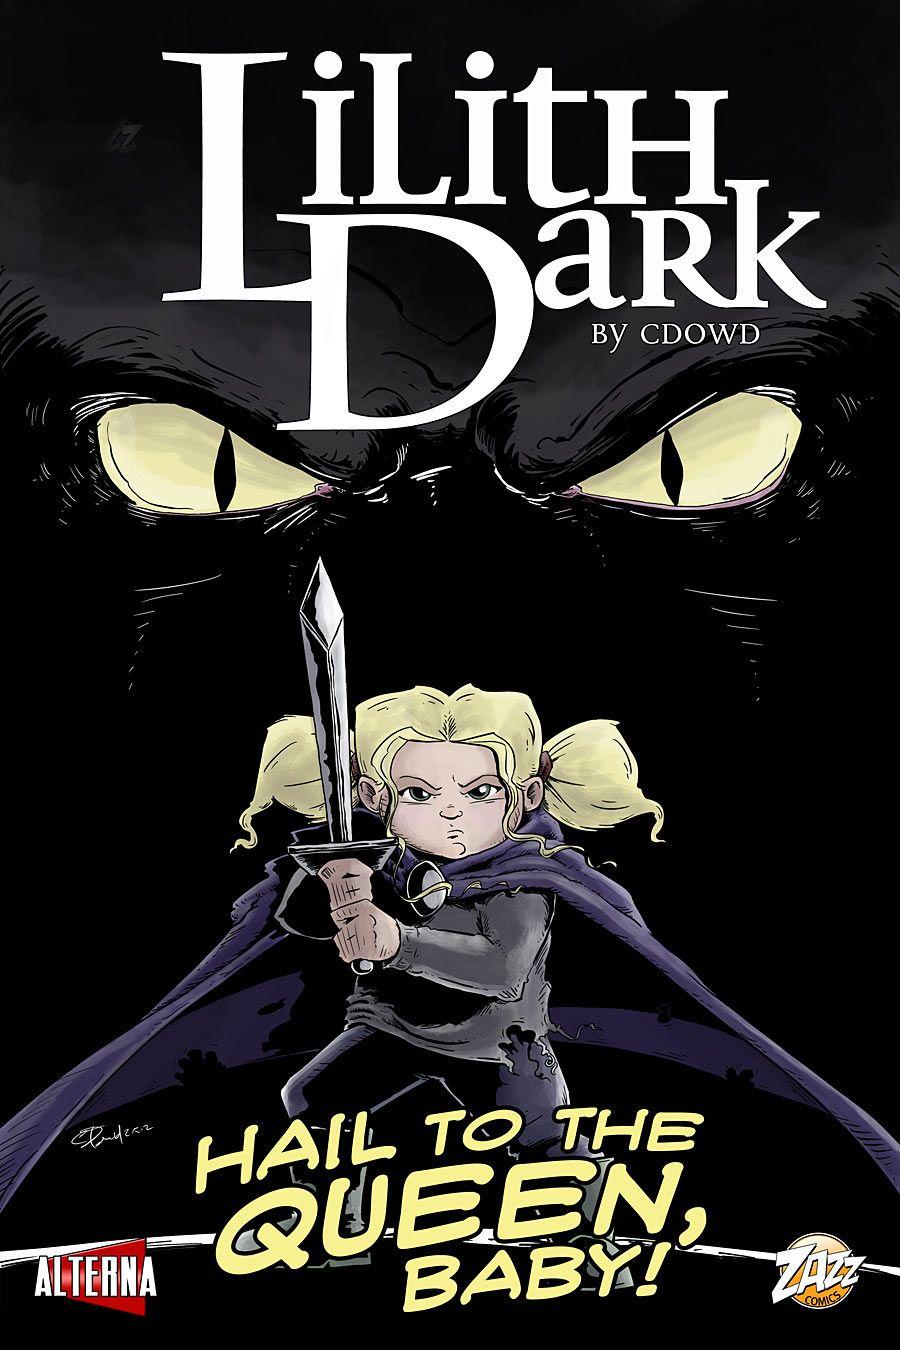 Lillith_Dark